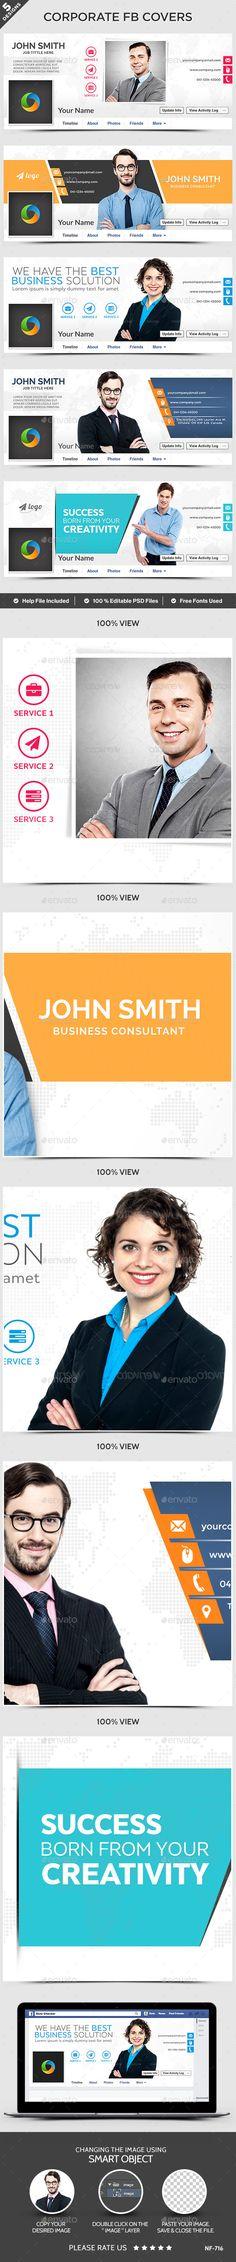 Corporate Facebook Covers - 5 Designs - Facebook Timeline Covers Social Media